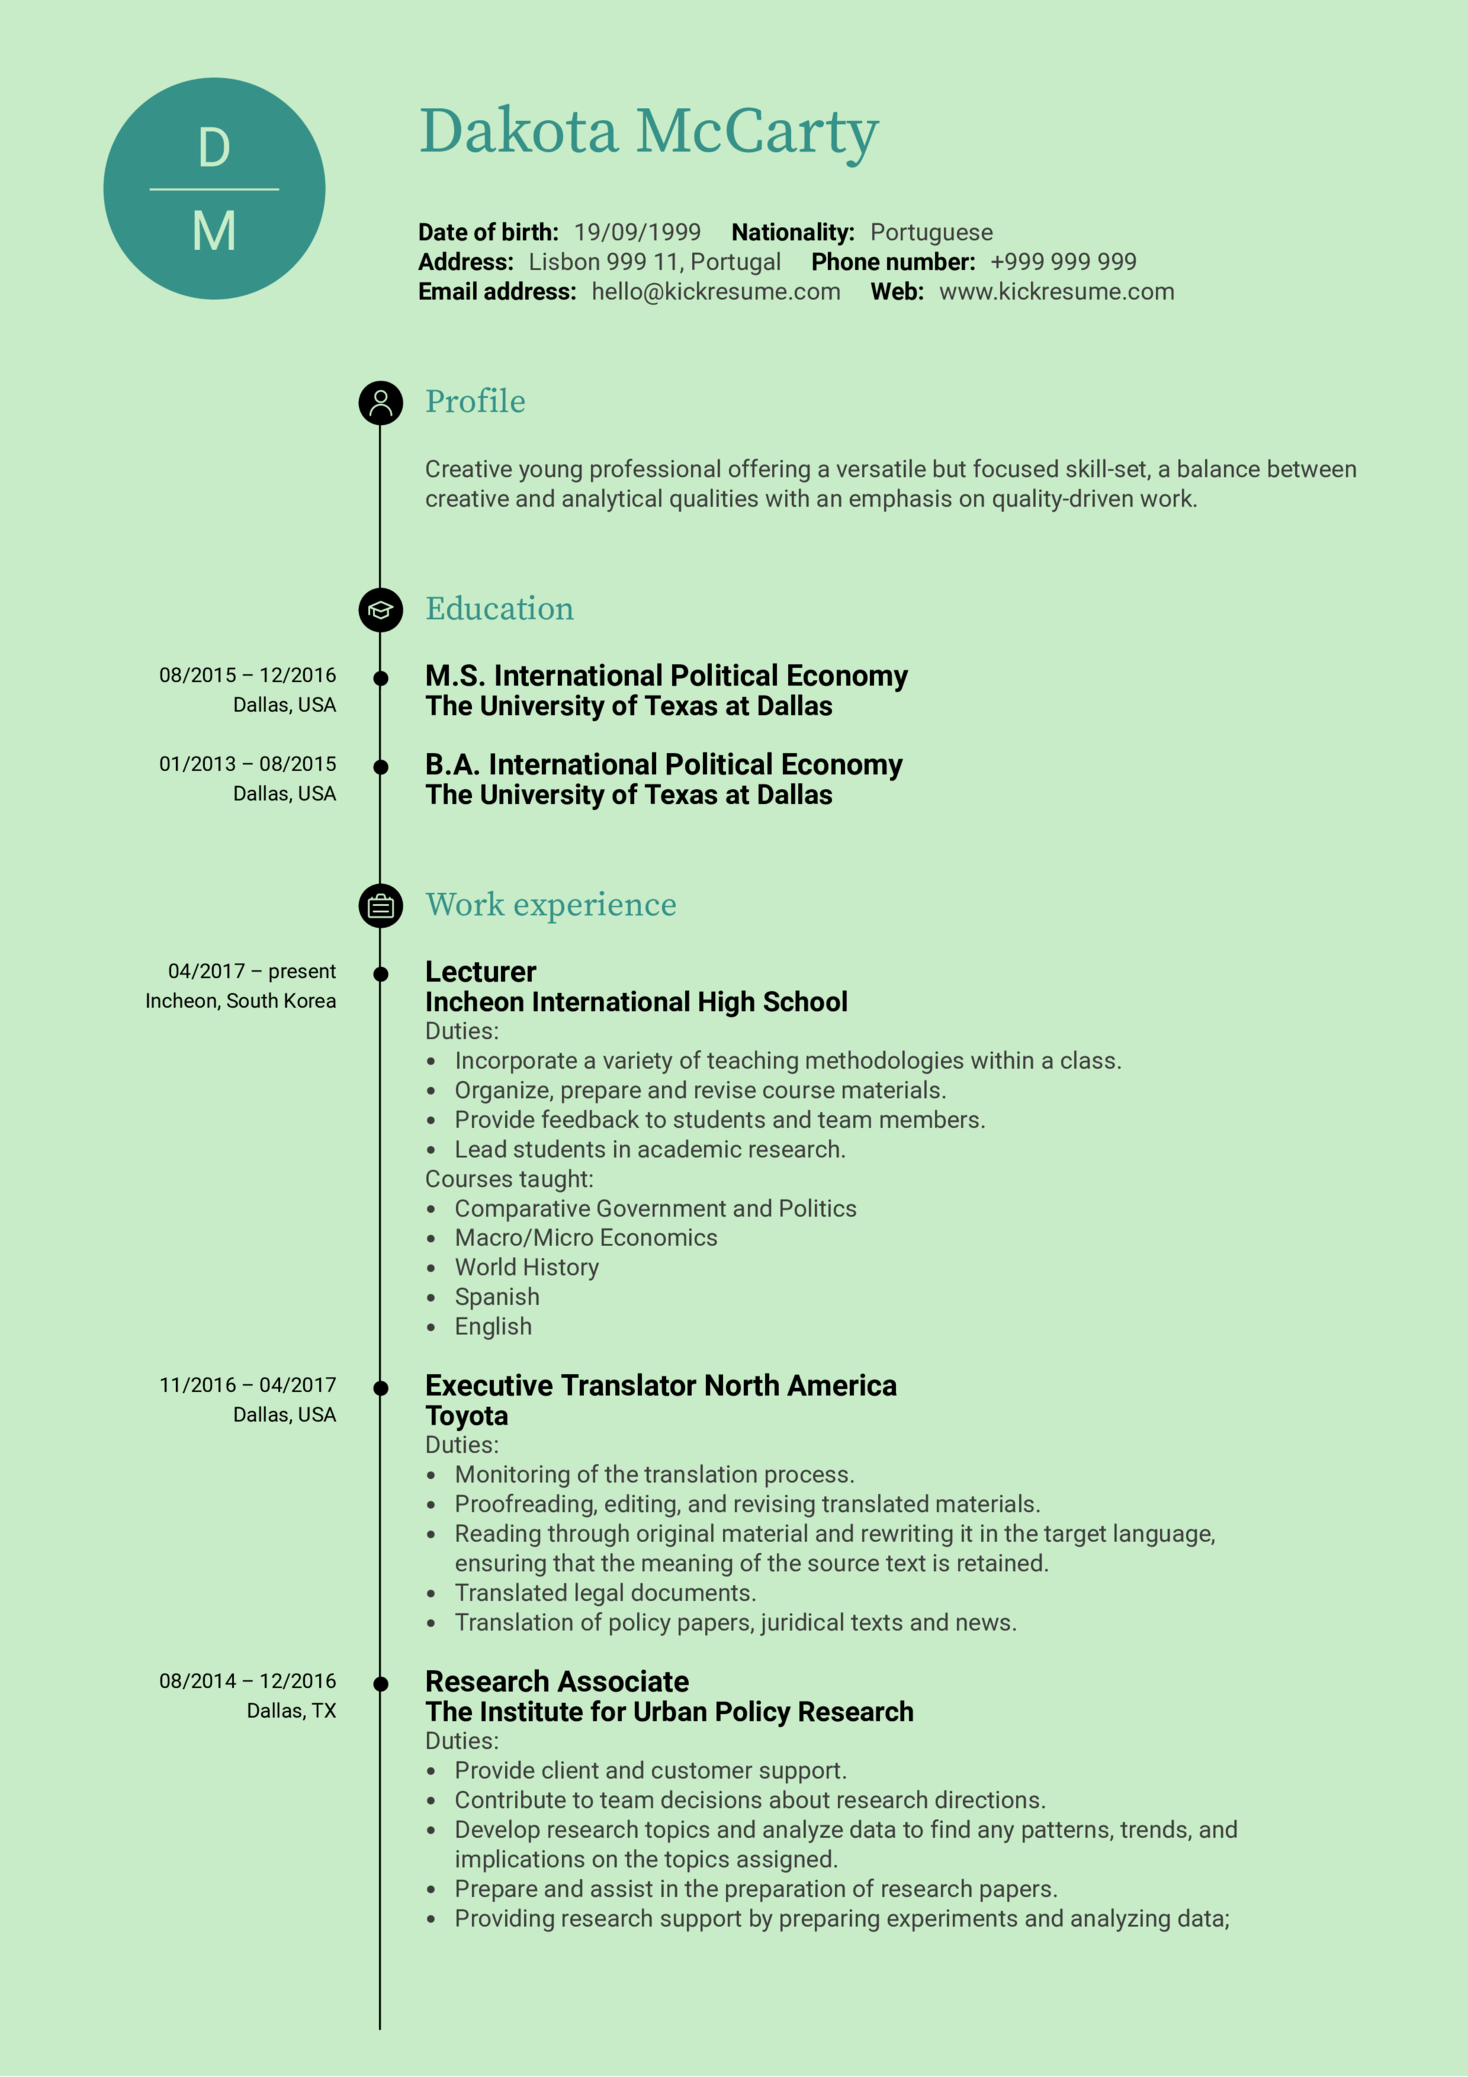 Support Analyst CV Sample (Part 1)